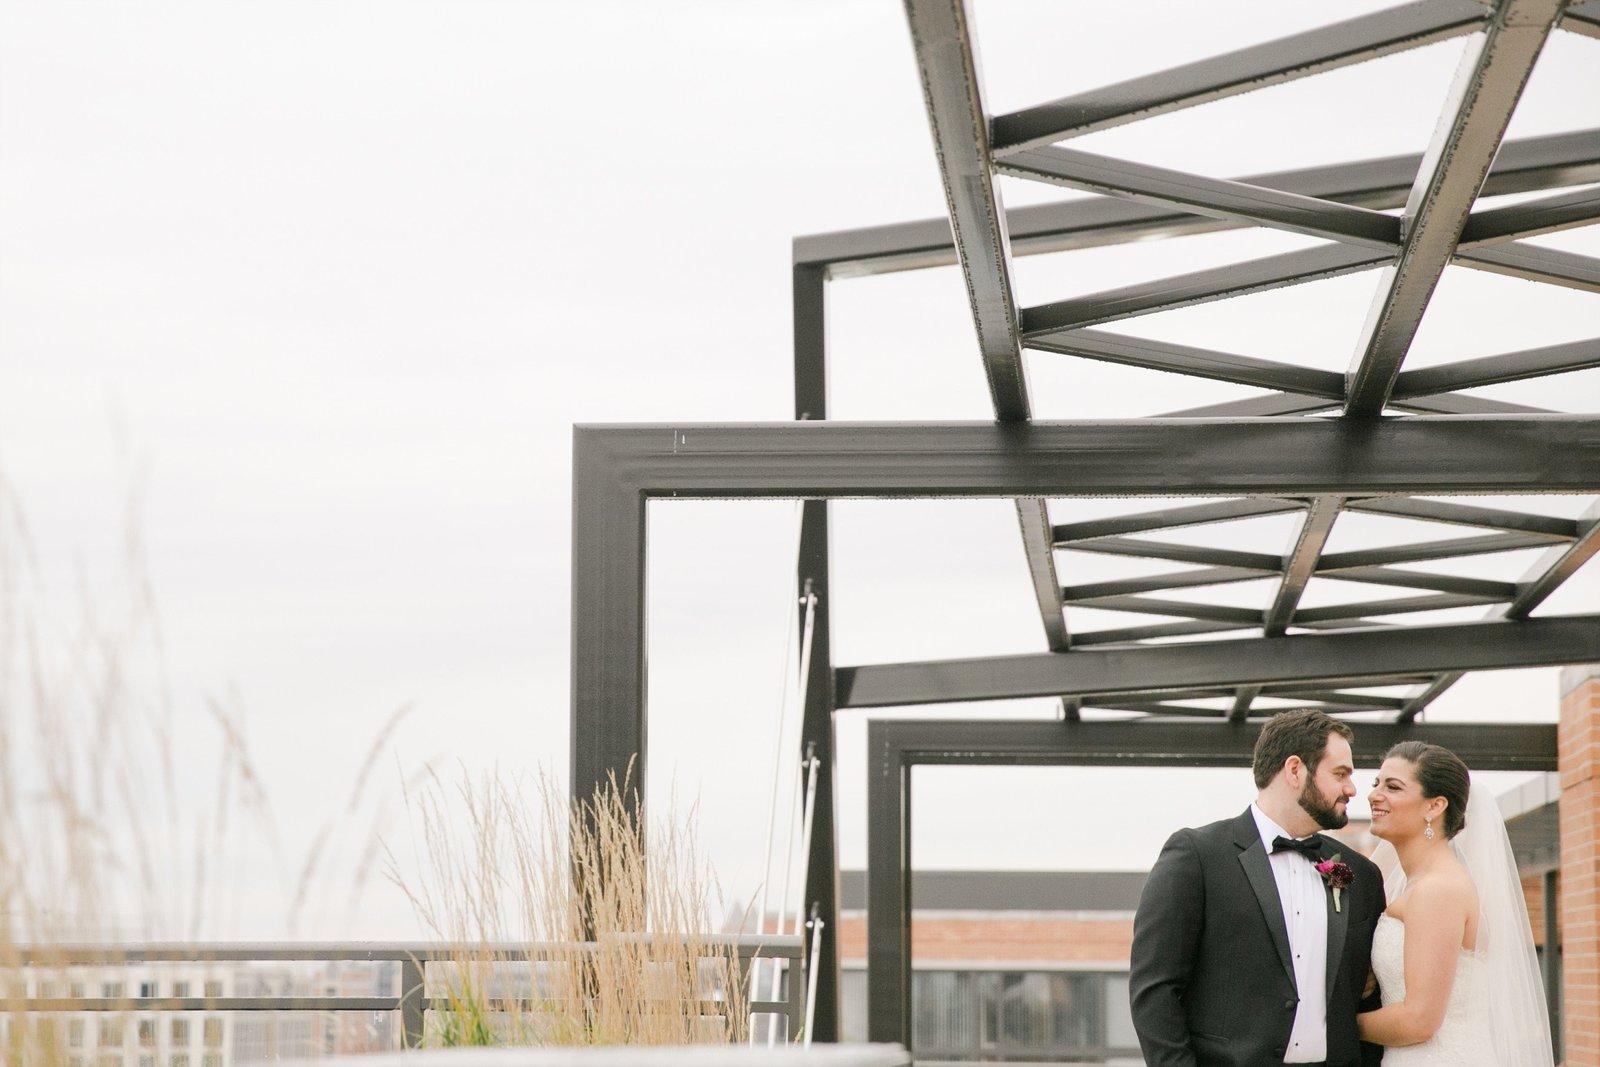 Black-tie-wedding-photos-longview-gallery-dc (143)